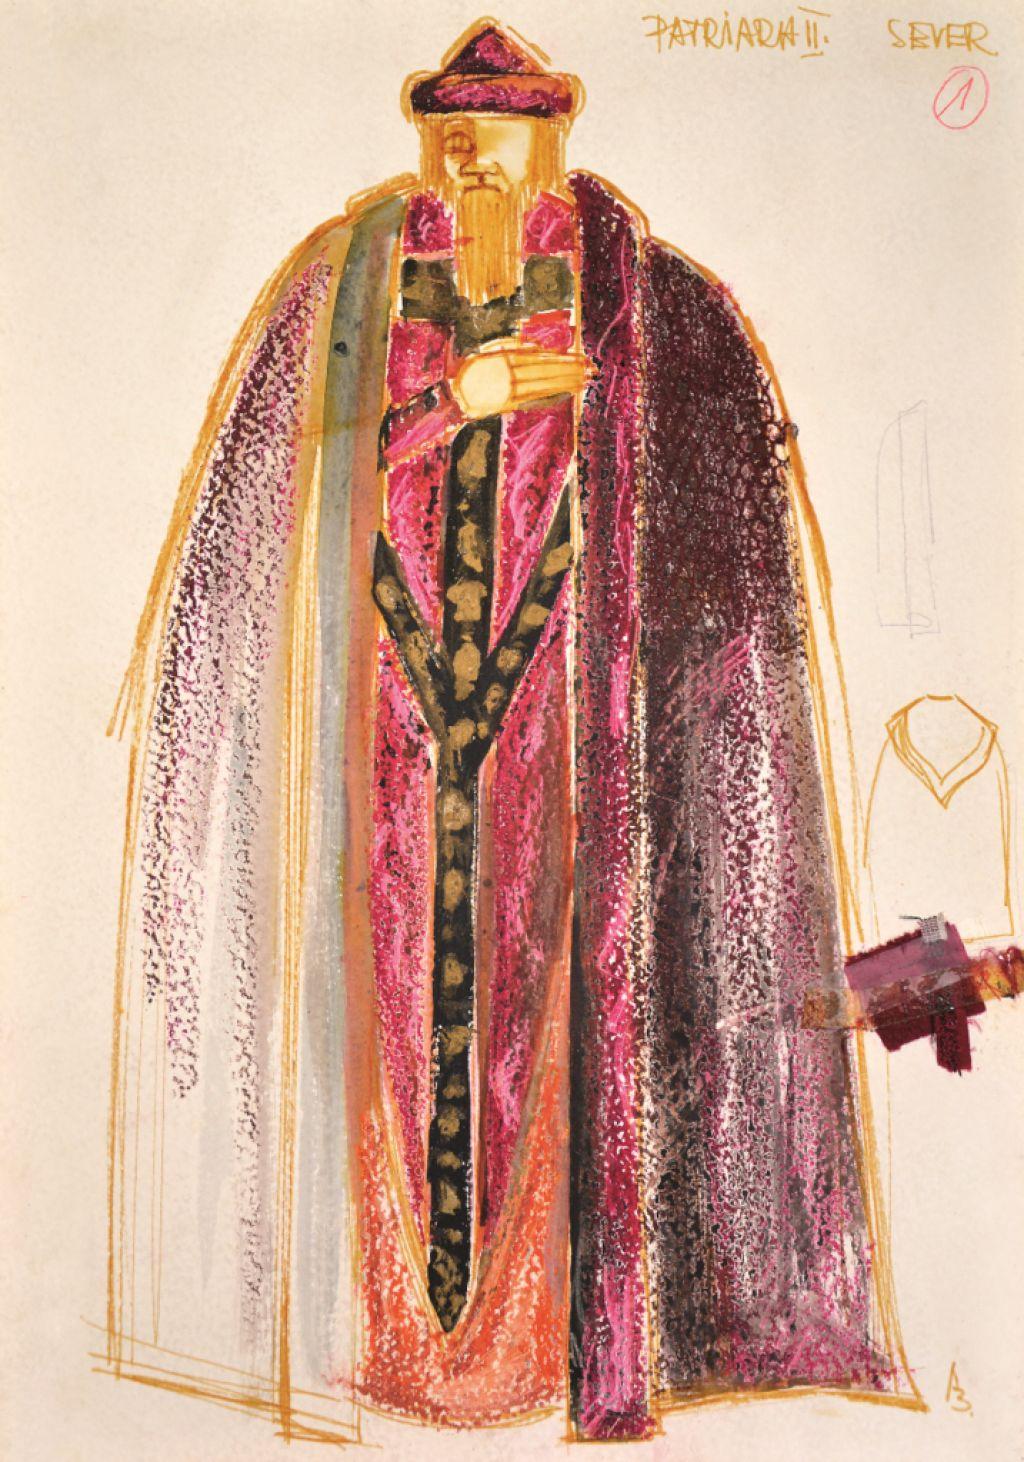 Kostumografka Alenka Bartl v muzeju V&A